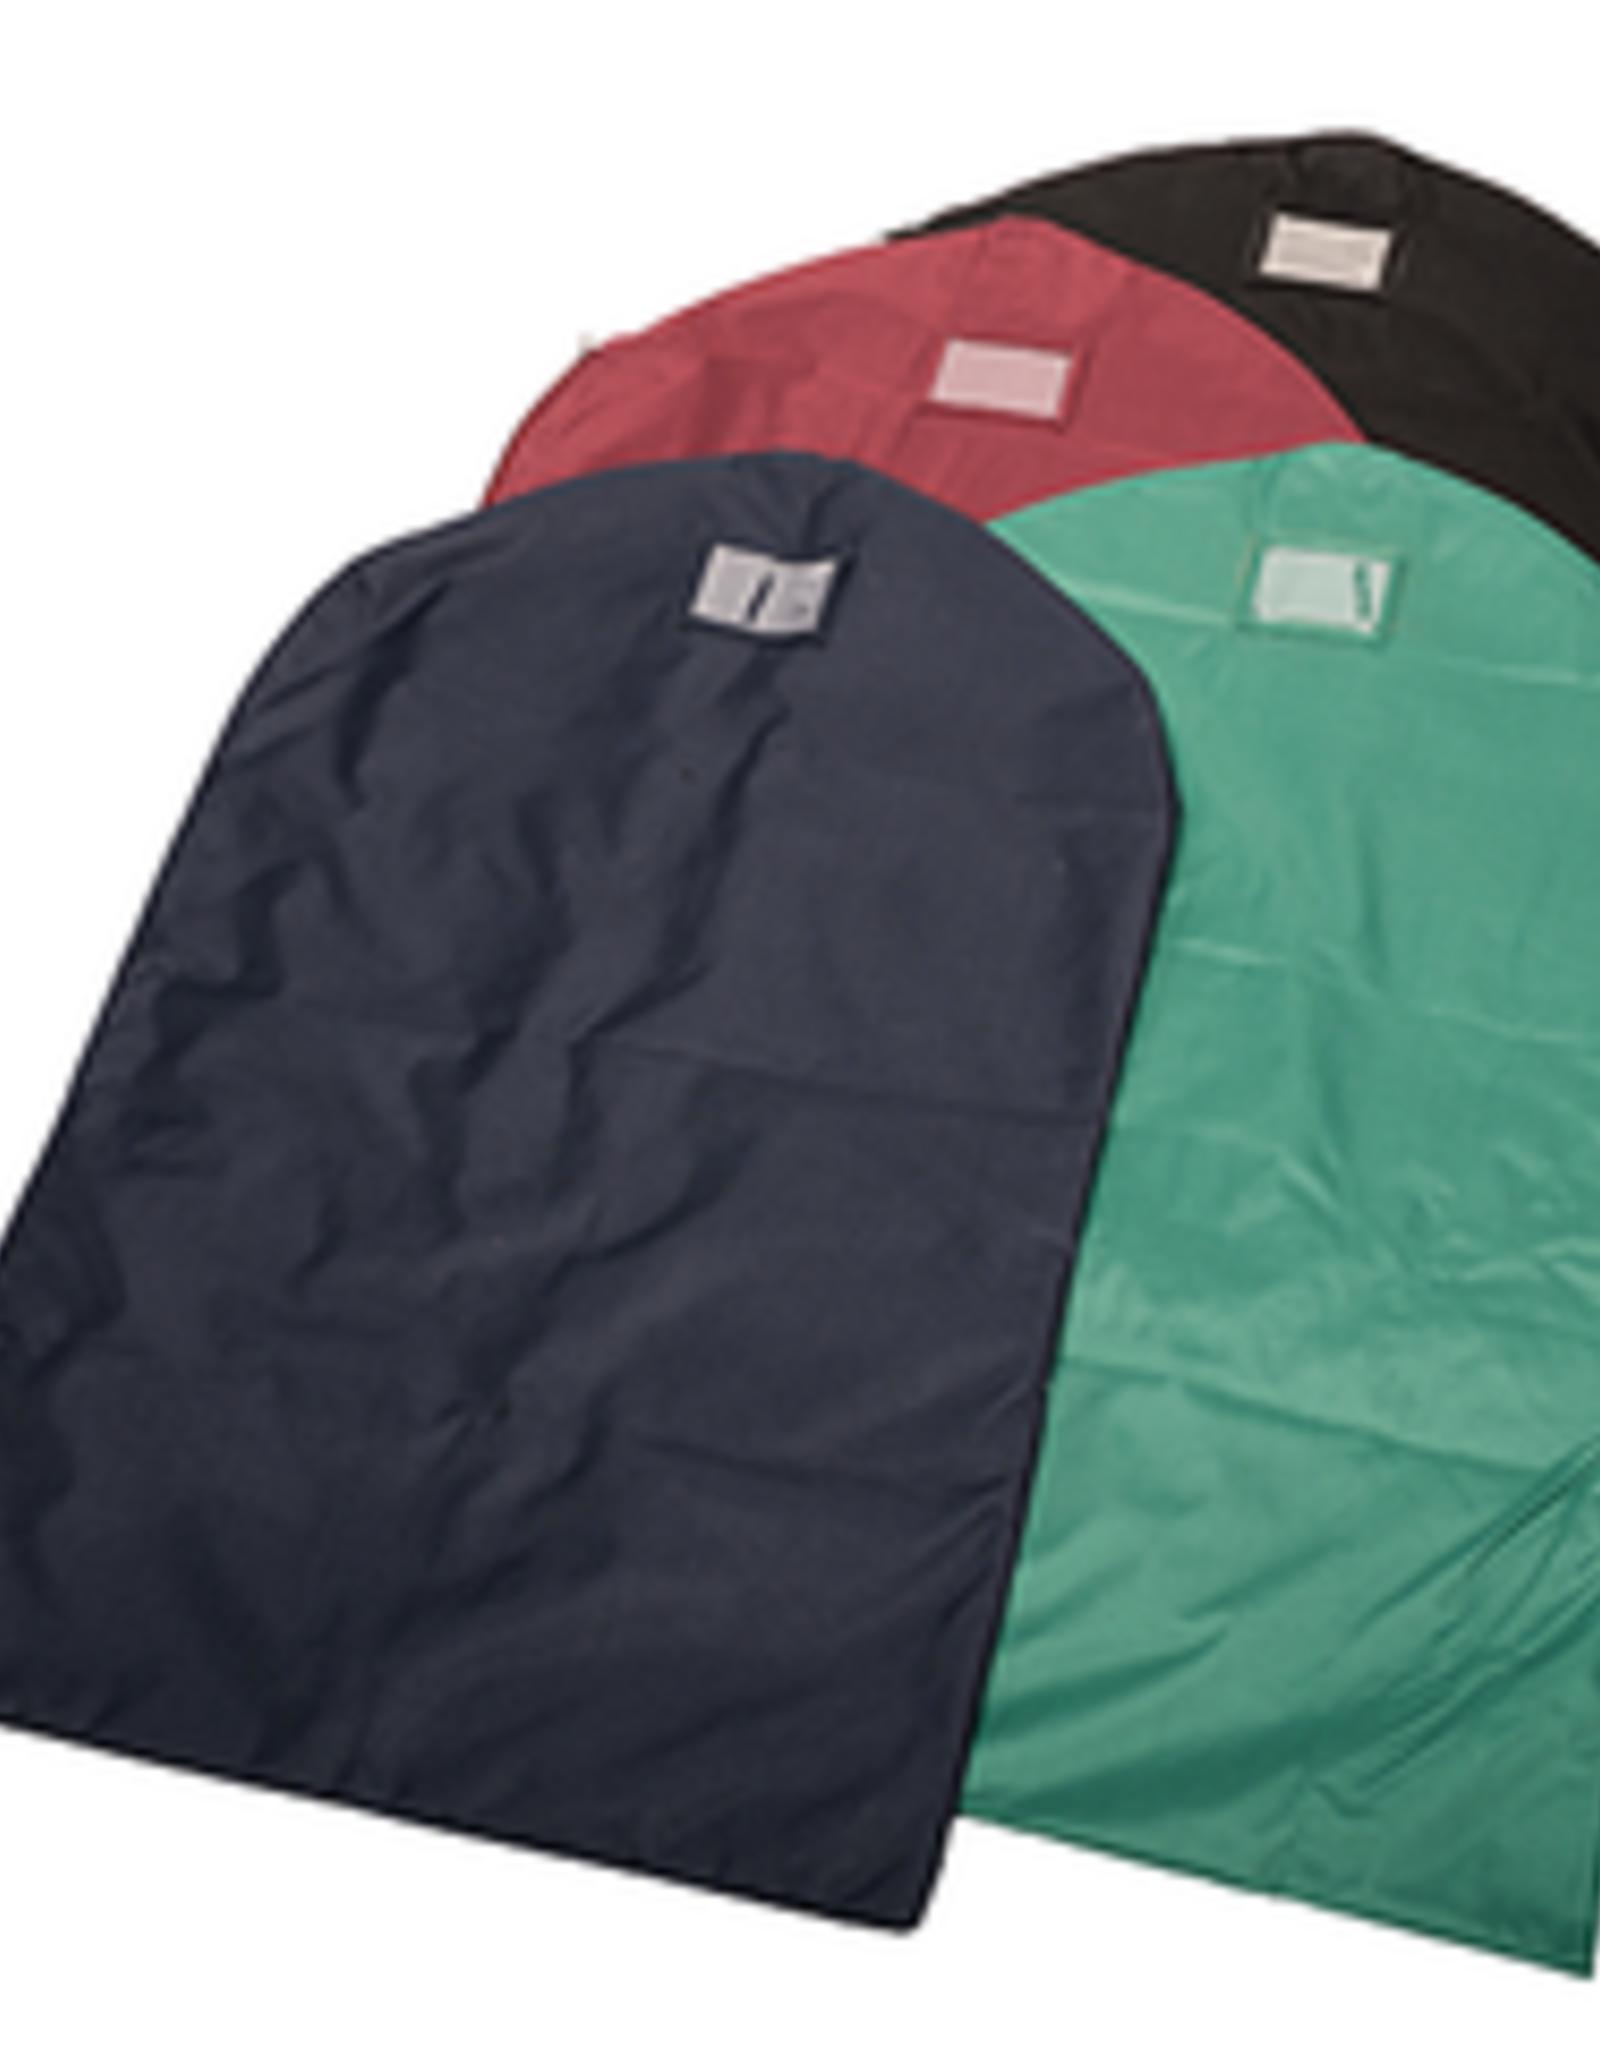 Chestnut Bay Garment Bags